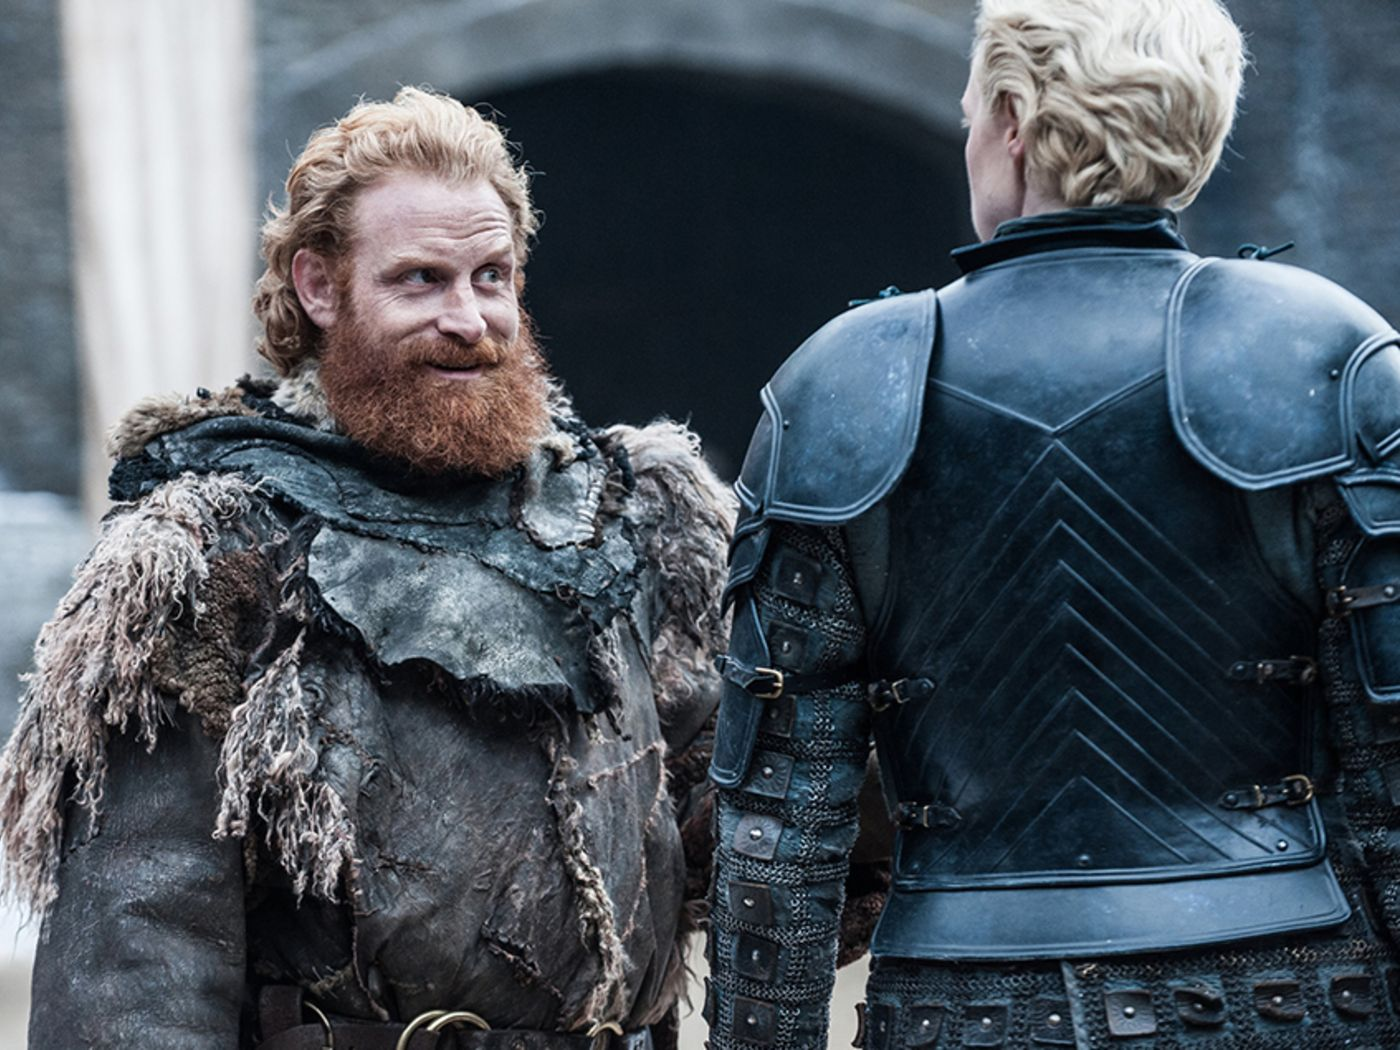 Brienne and Tormund in Game of Thrones season 7